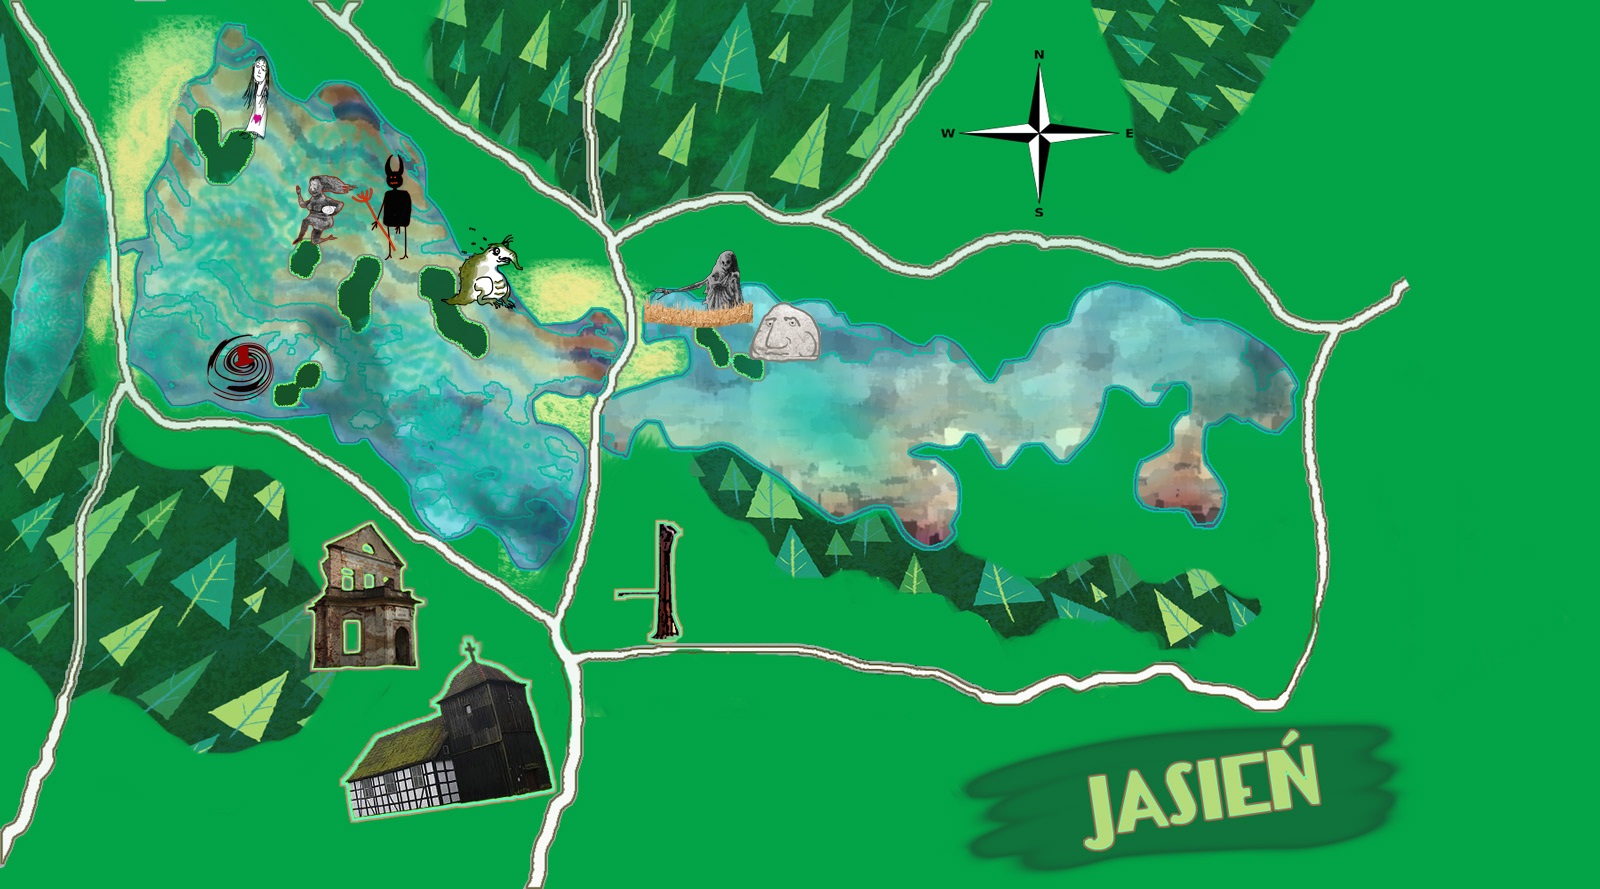 mapa-jasienx